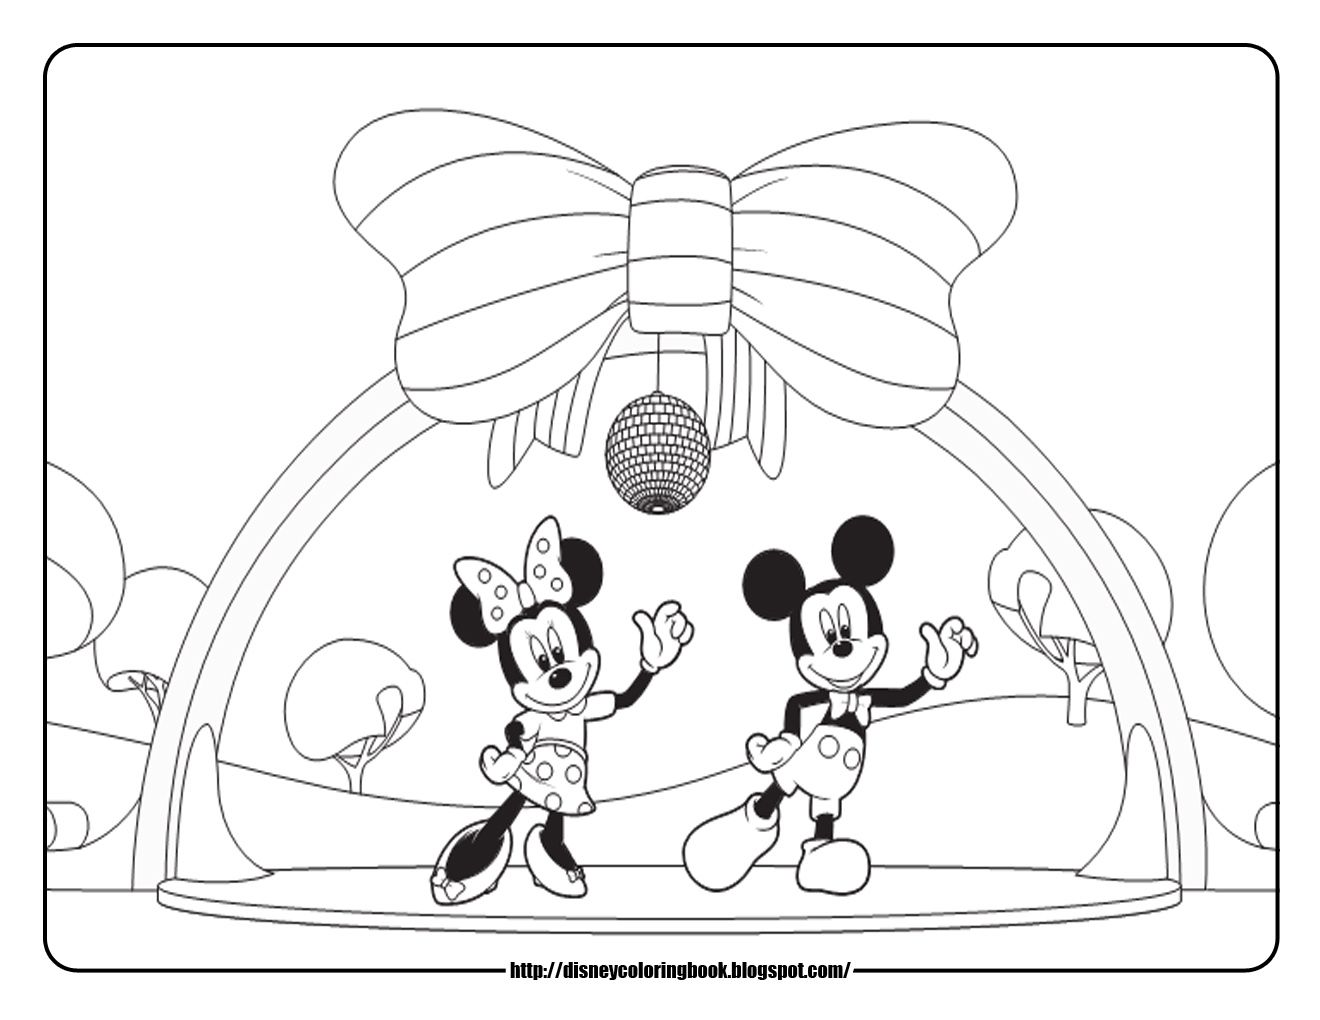 disney coloring pages | Kolton Birthday Ideas | Pinterest | Mickey ...